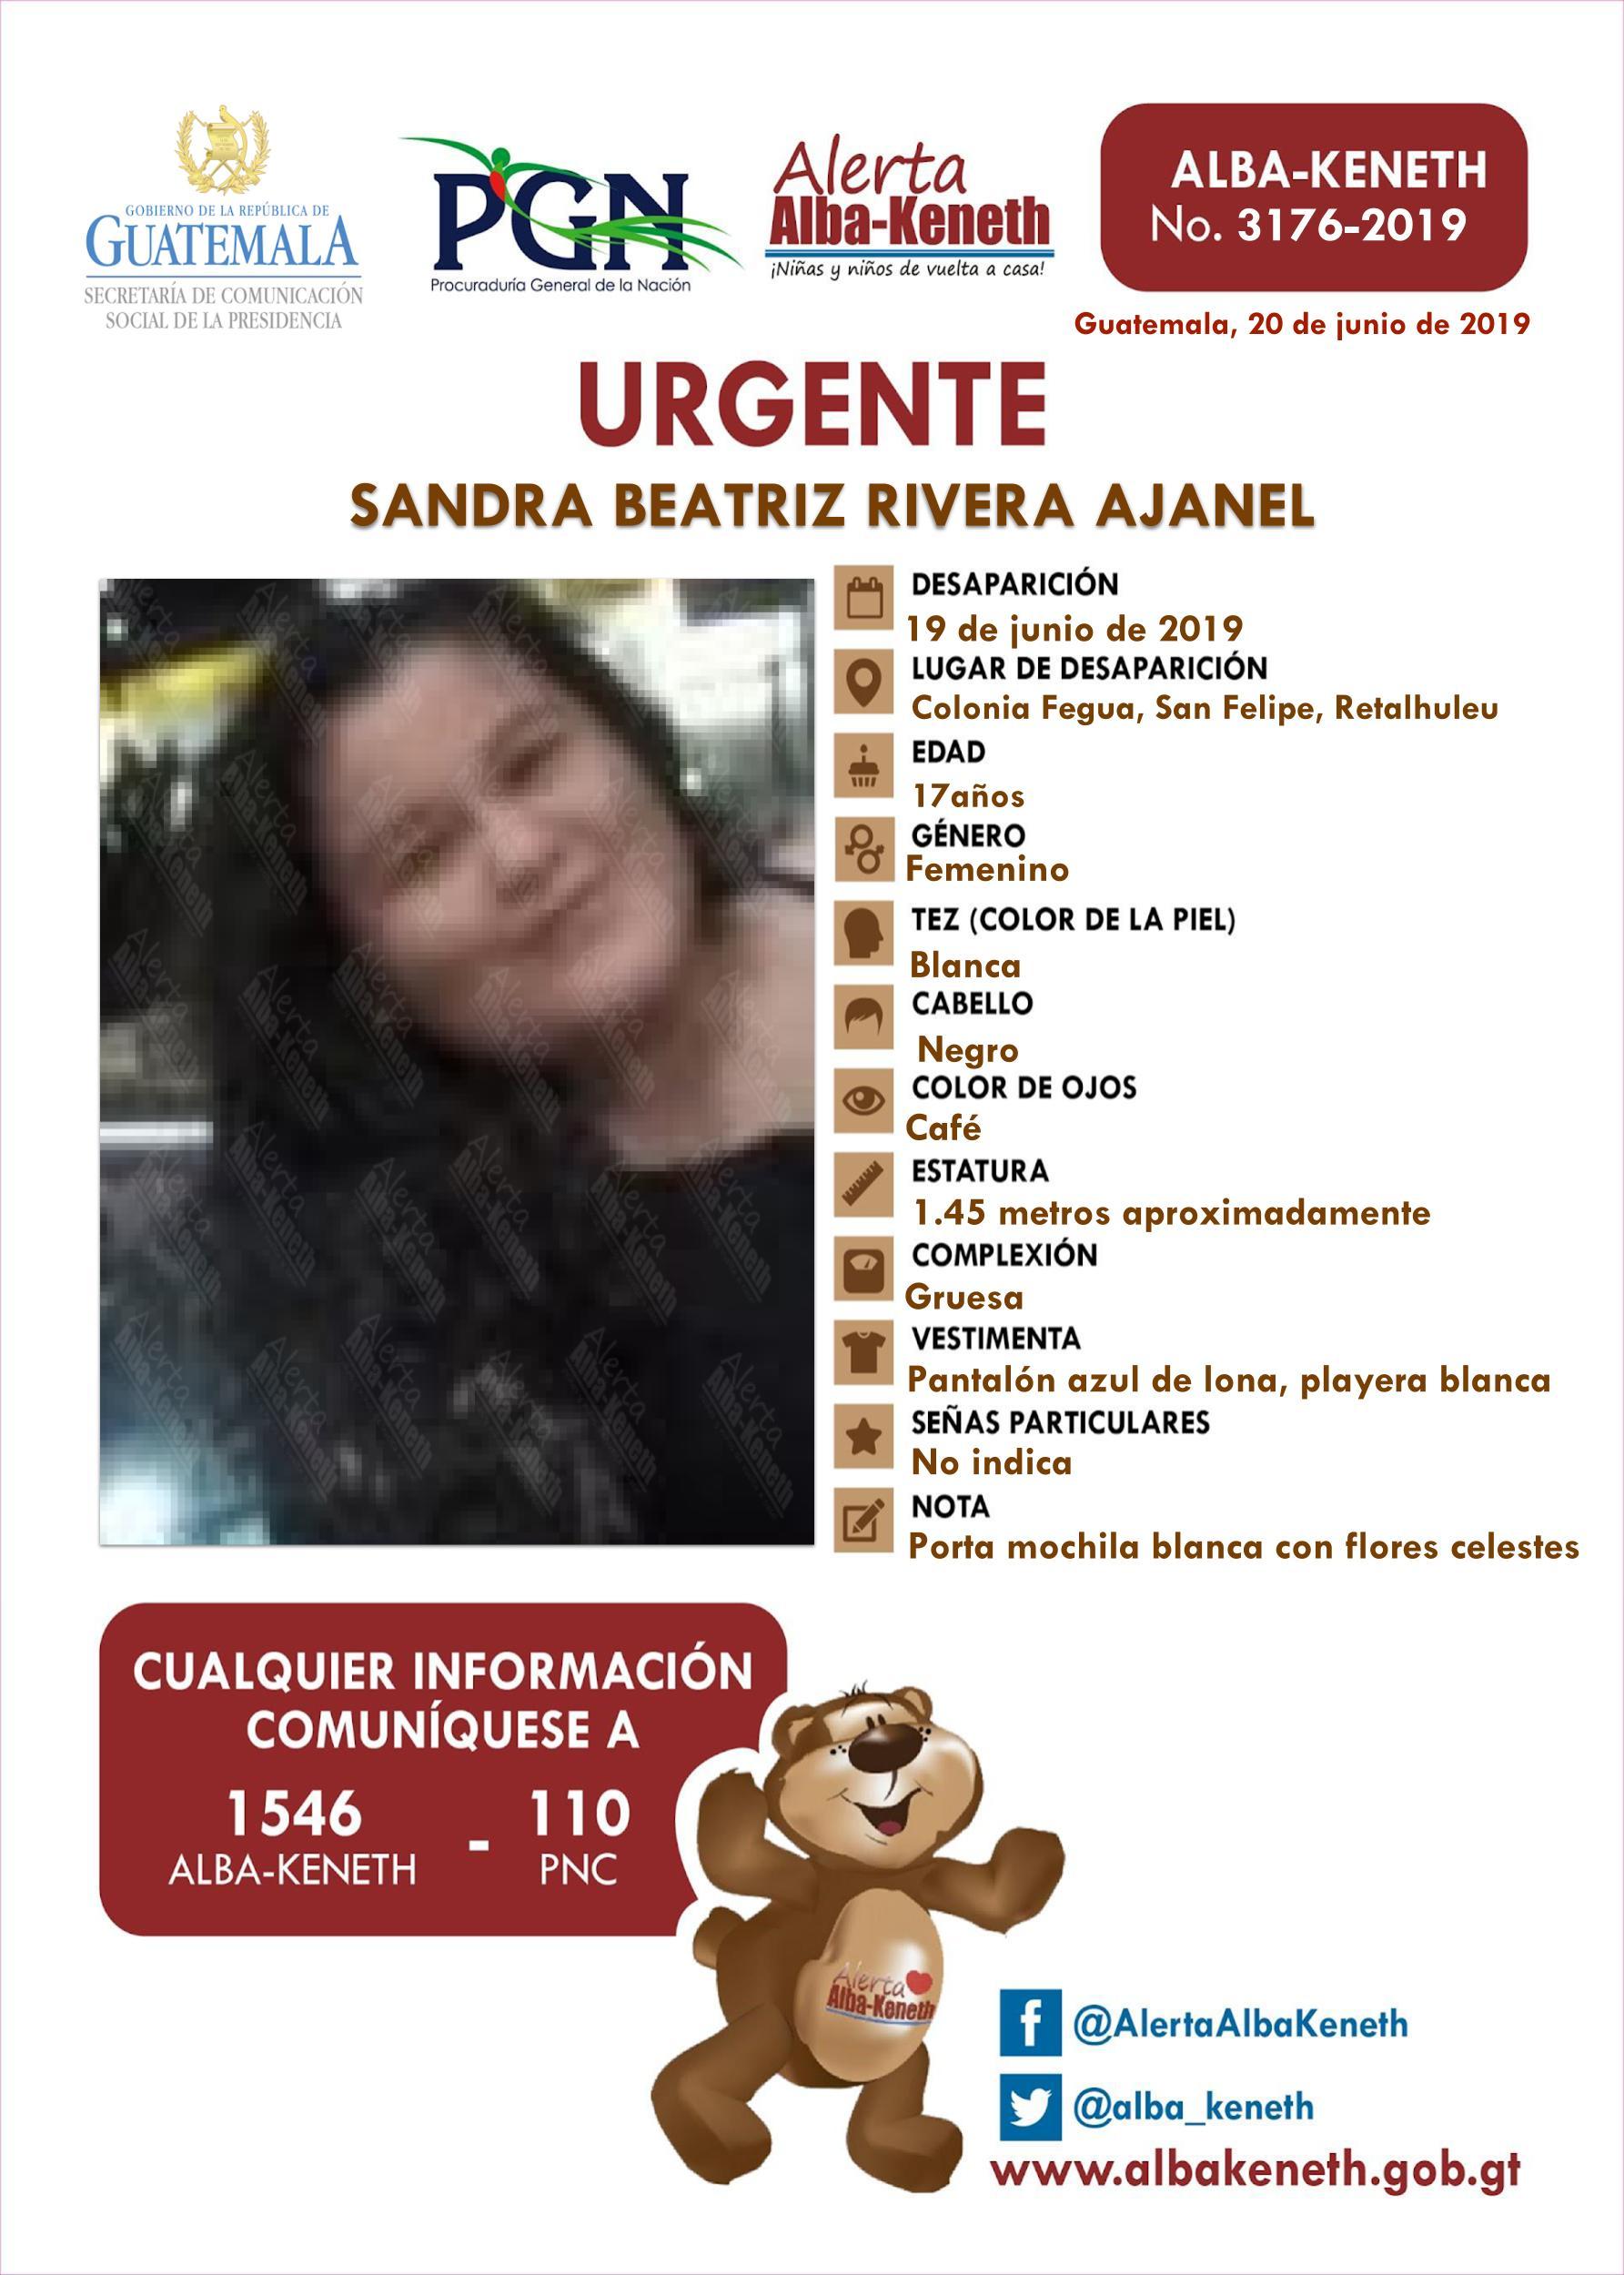 Sandra Beatriz Rivera Ajanel